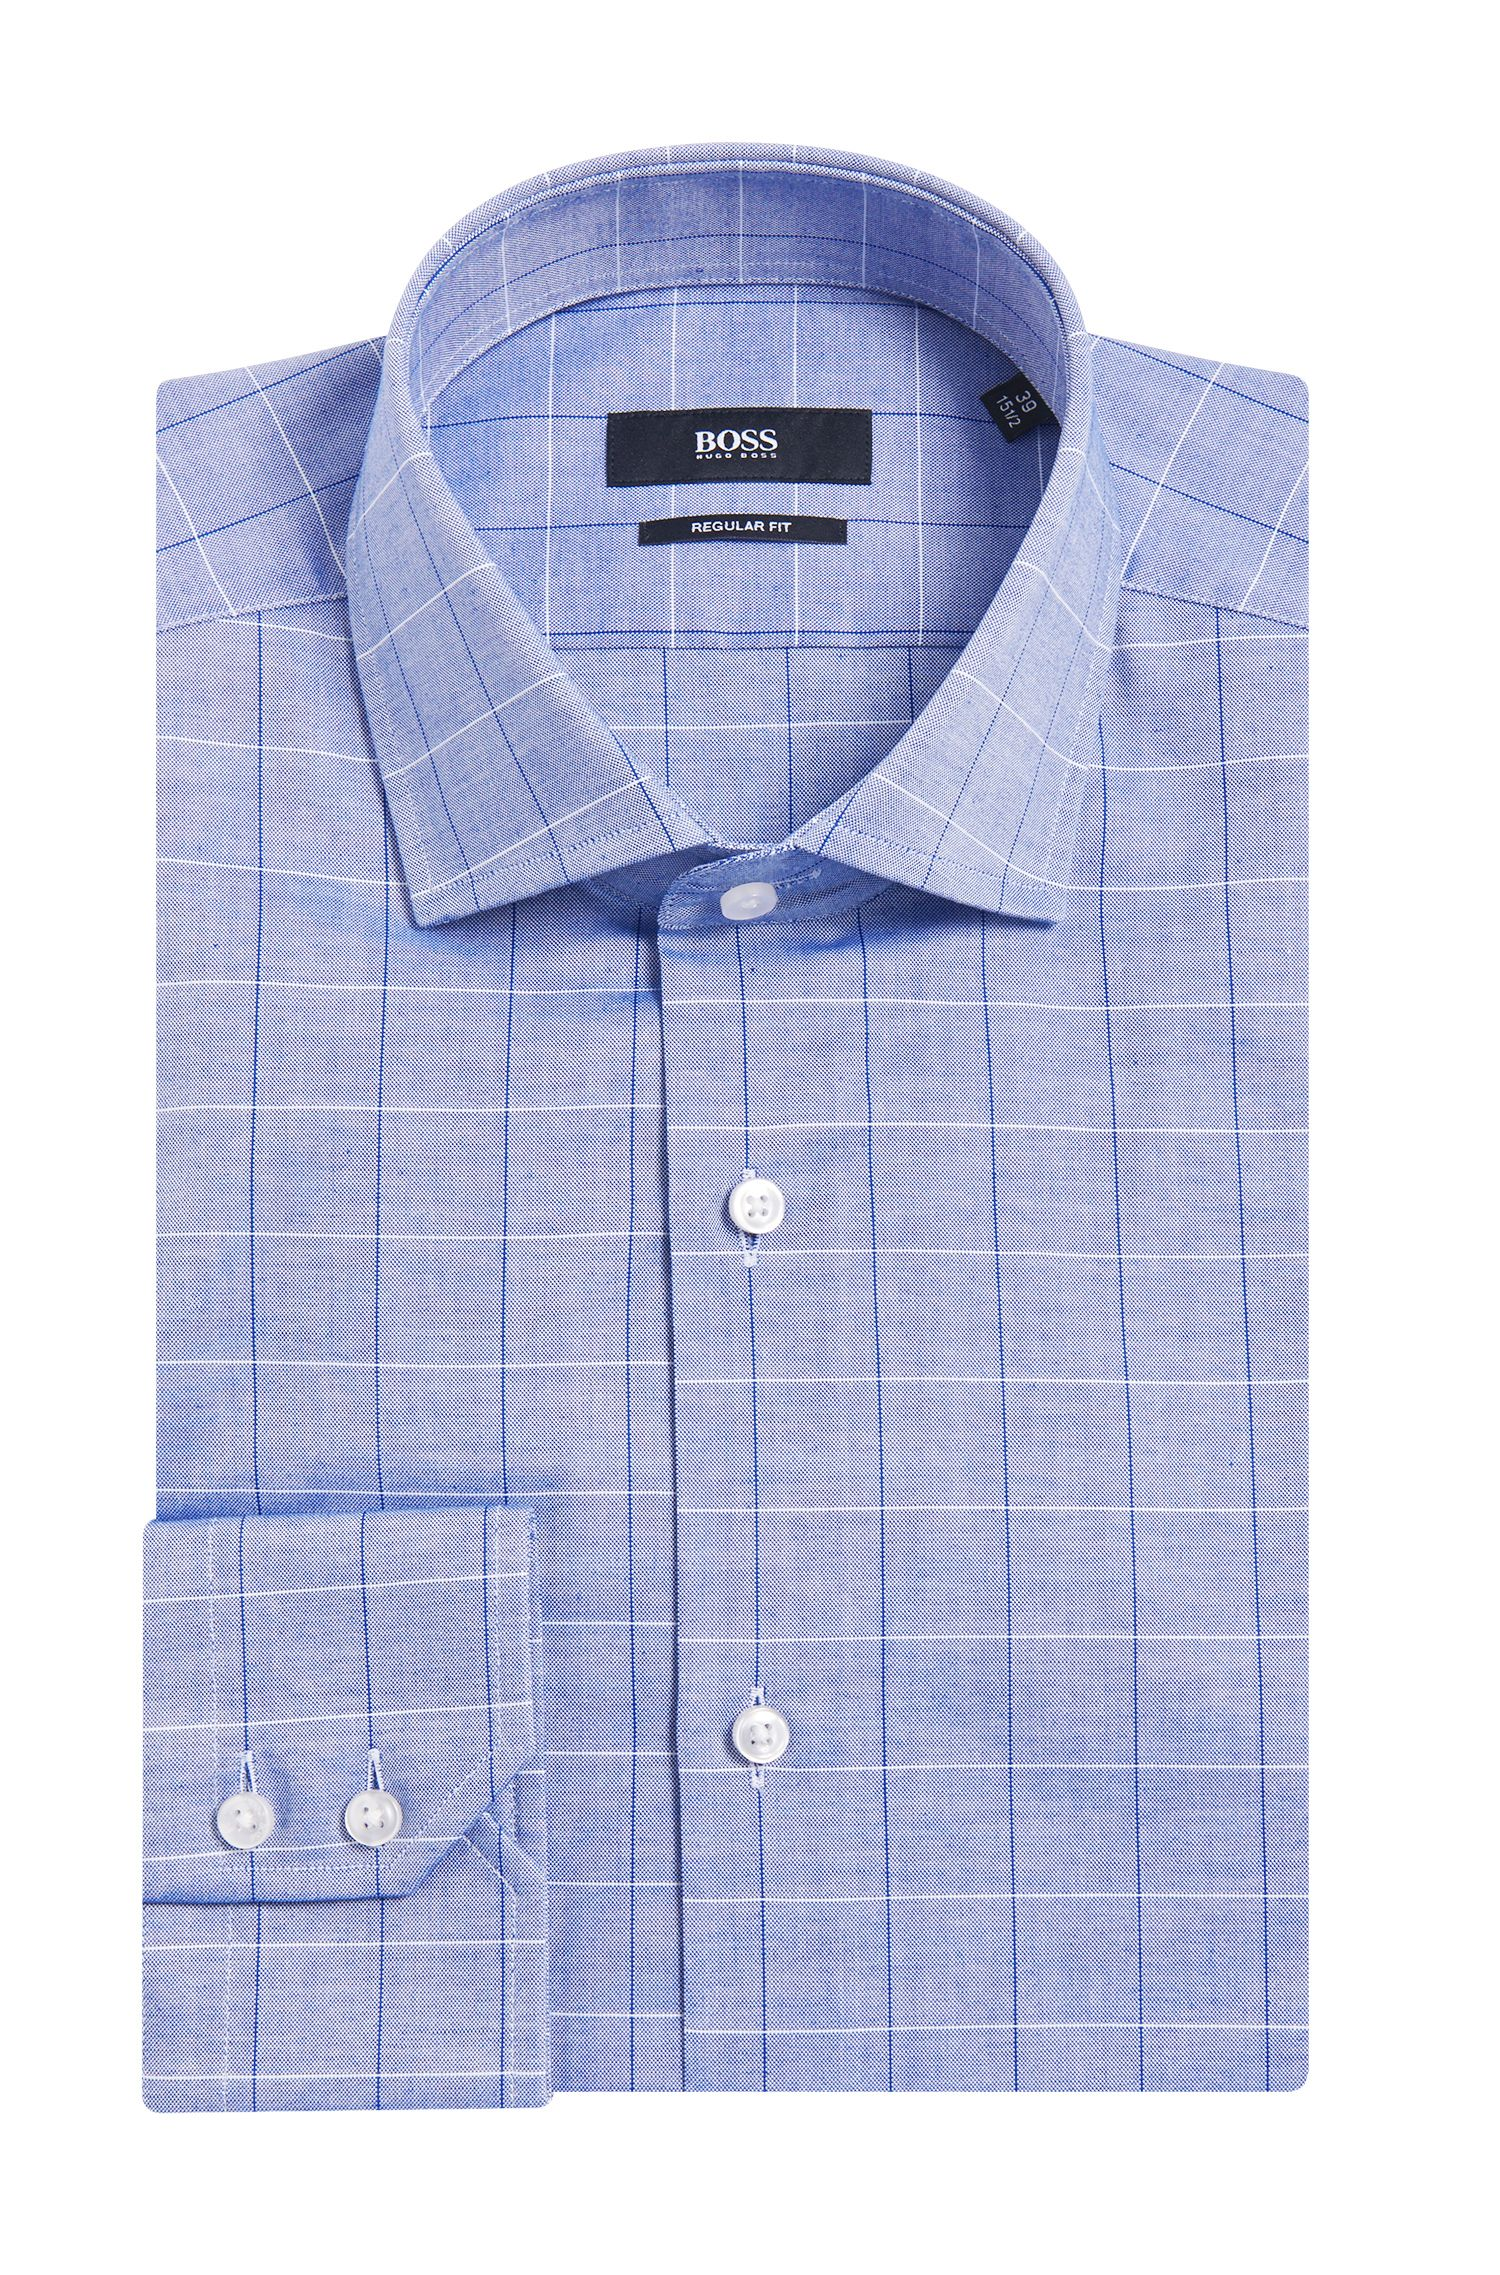 'Gordon' | Regular Fit, Italian Cotton Dress Shirt